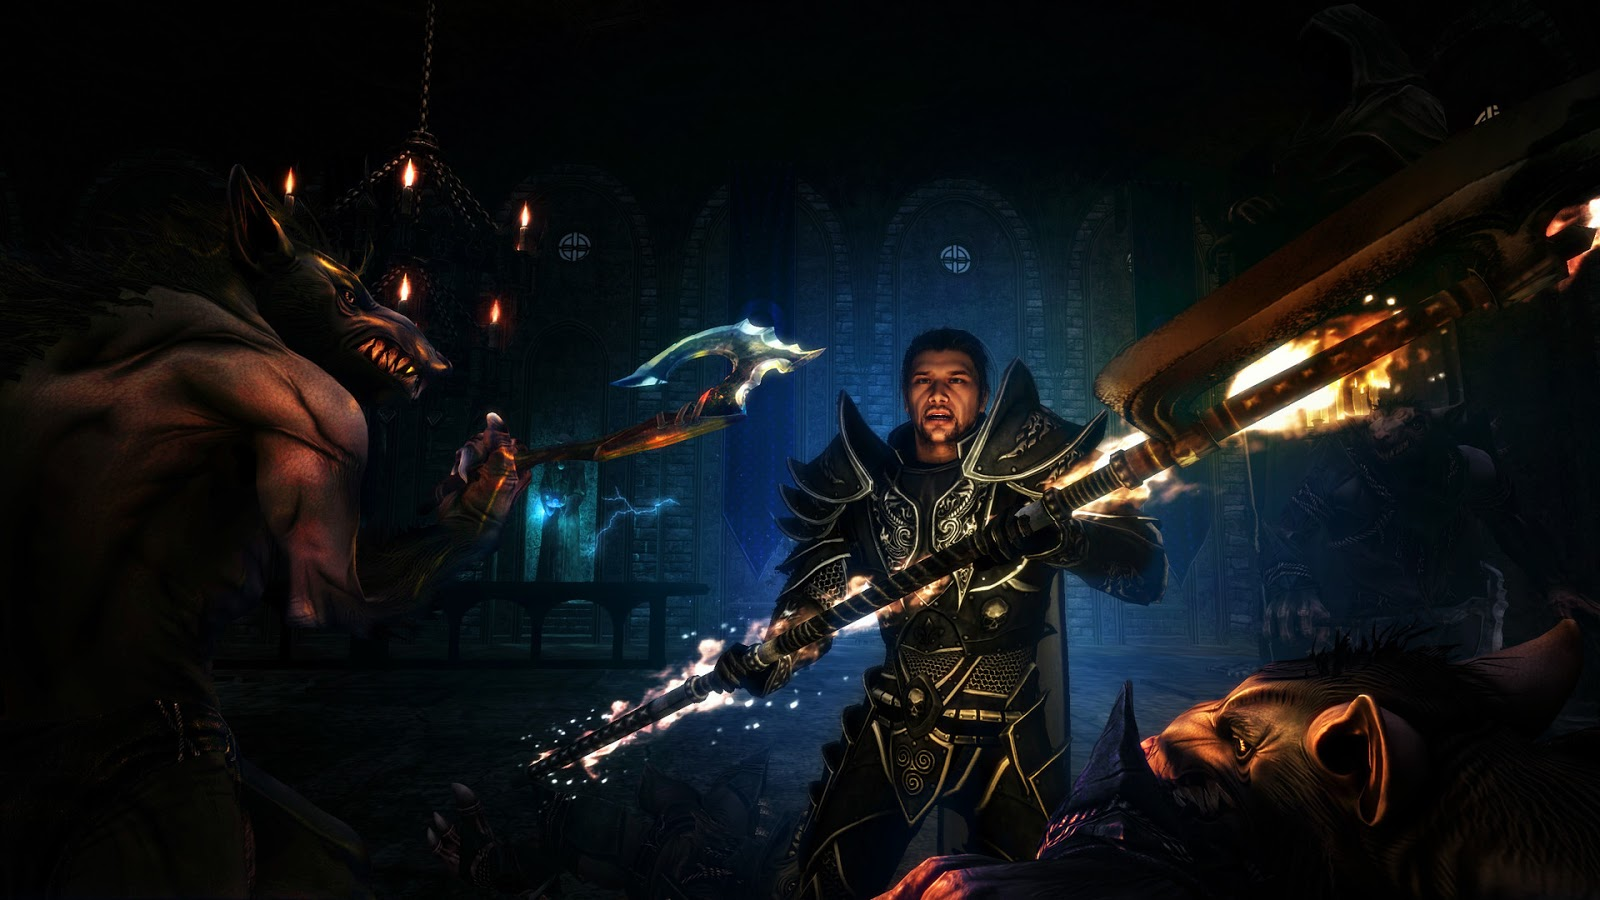 Two Worlds II HD: Call Of The Tenebrae